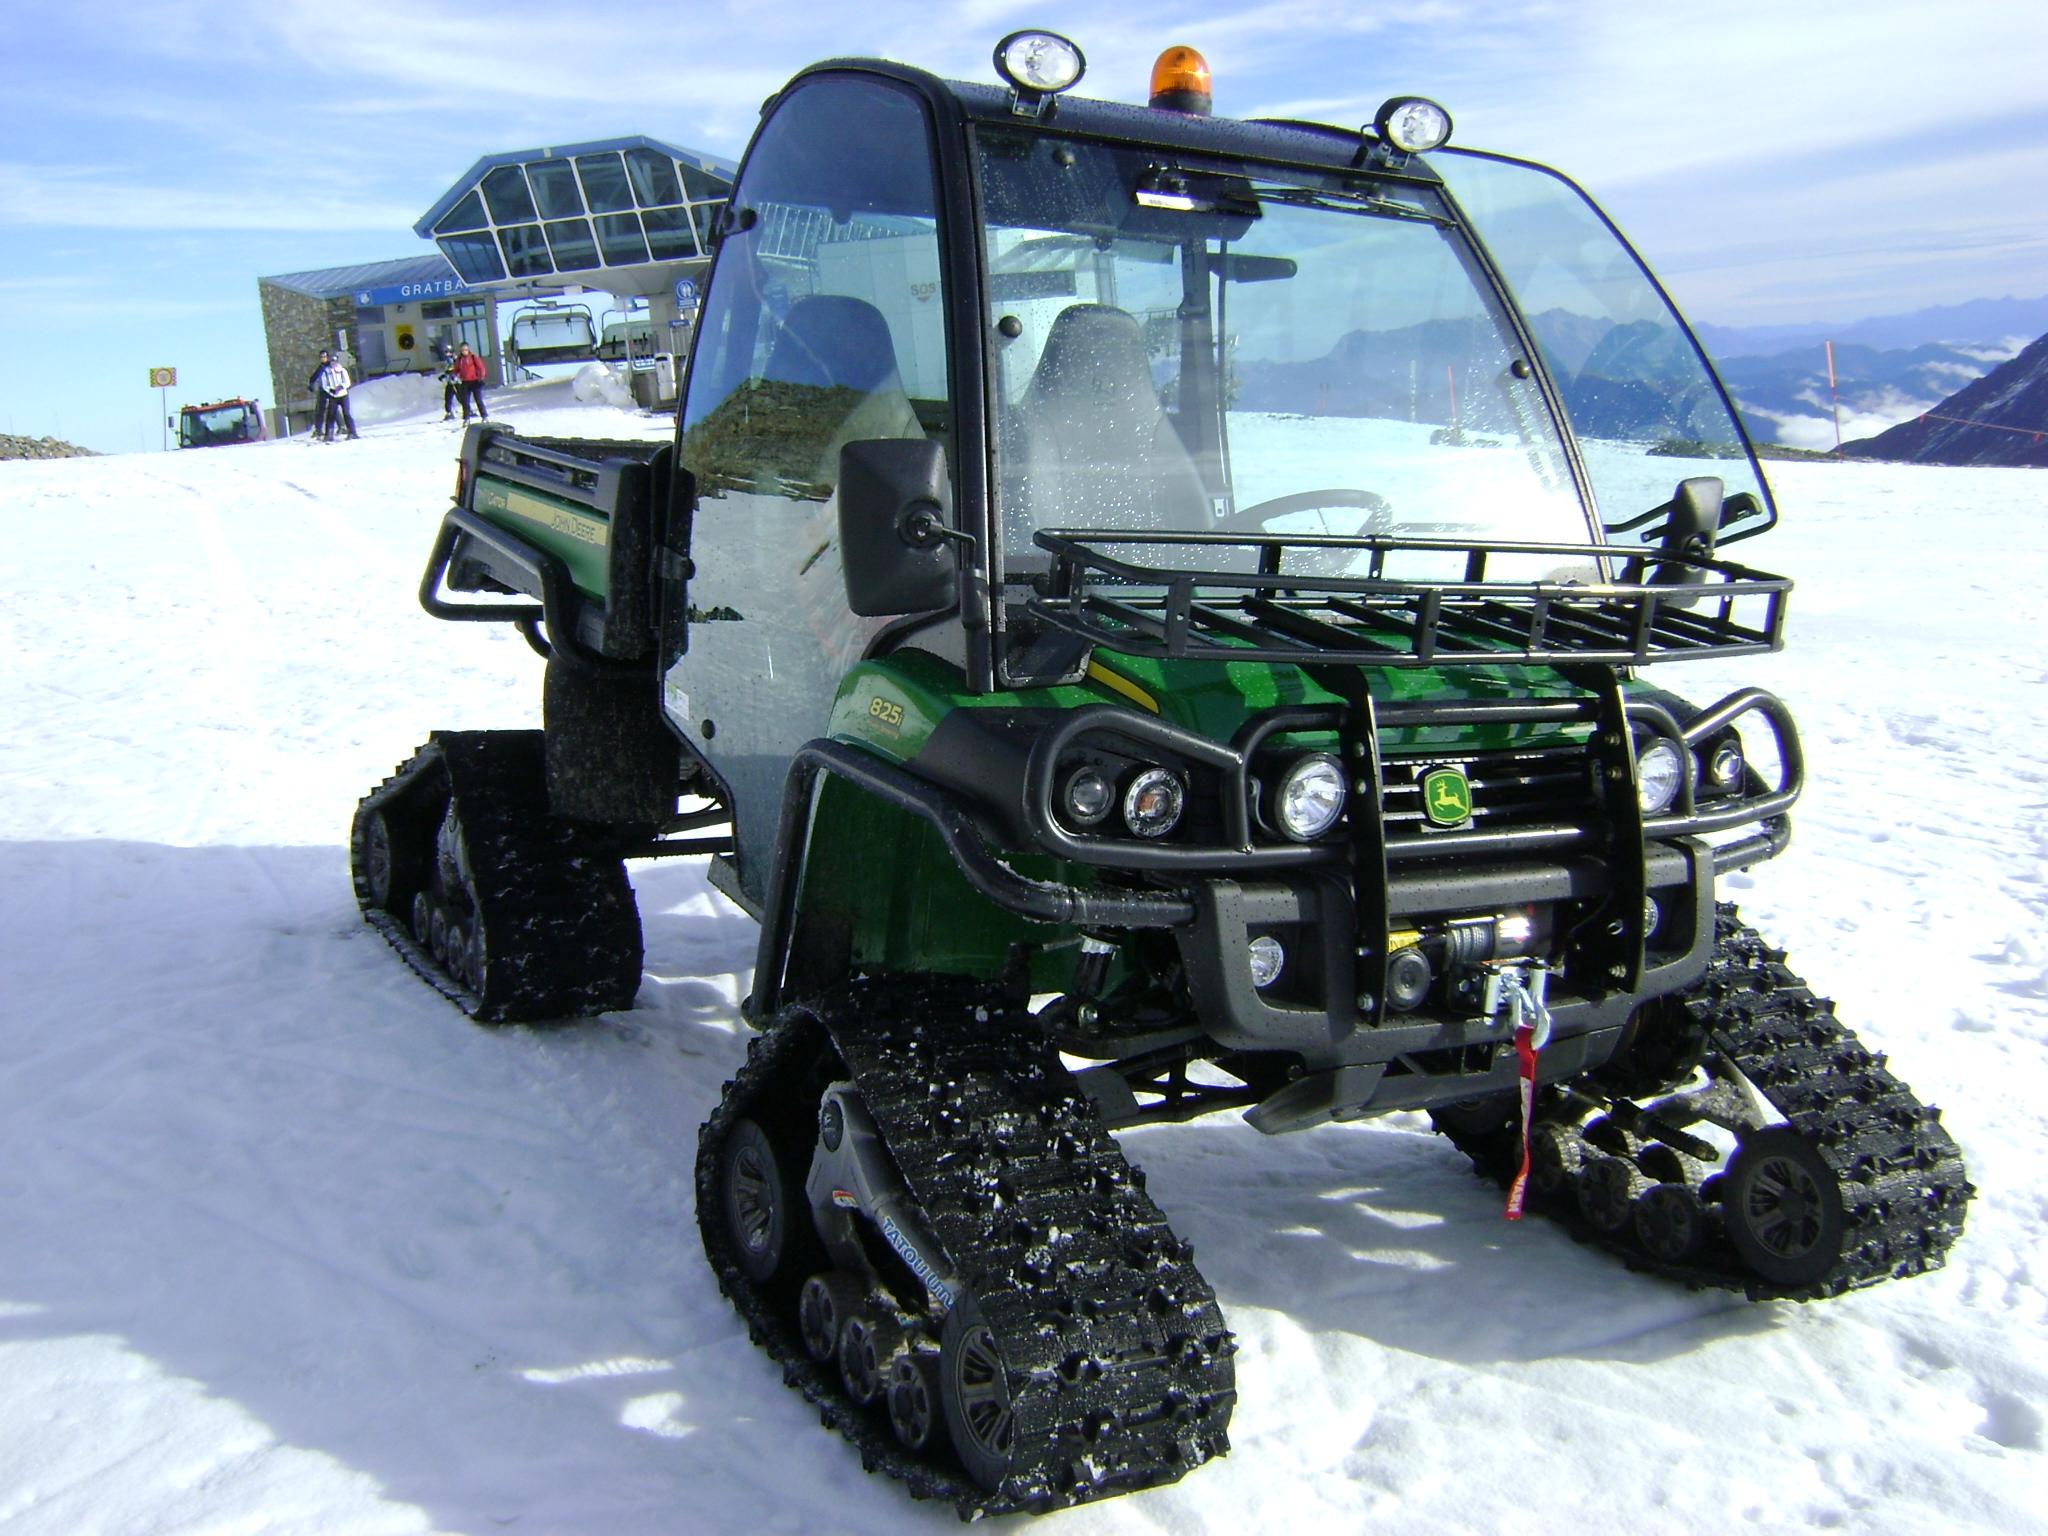 John Deere Gator >> JOHN-DEERE GATOR jetzt auch mit Winterausrüstung. | LMB Landmaschinen Burtscher Nüziders